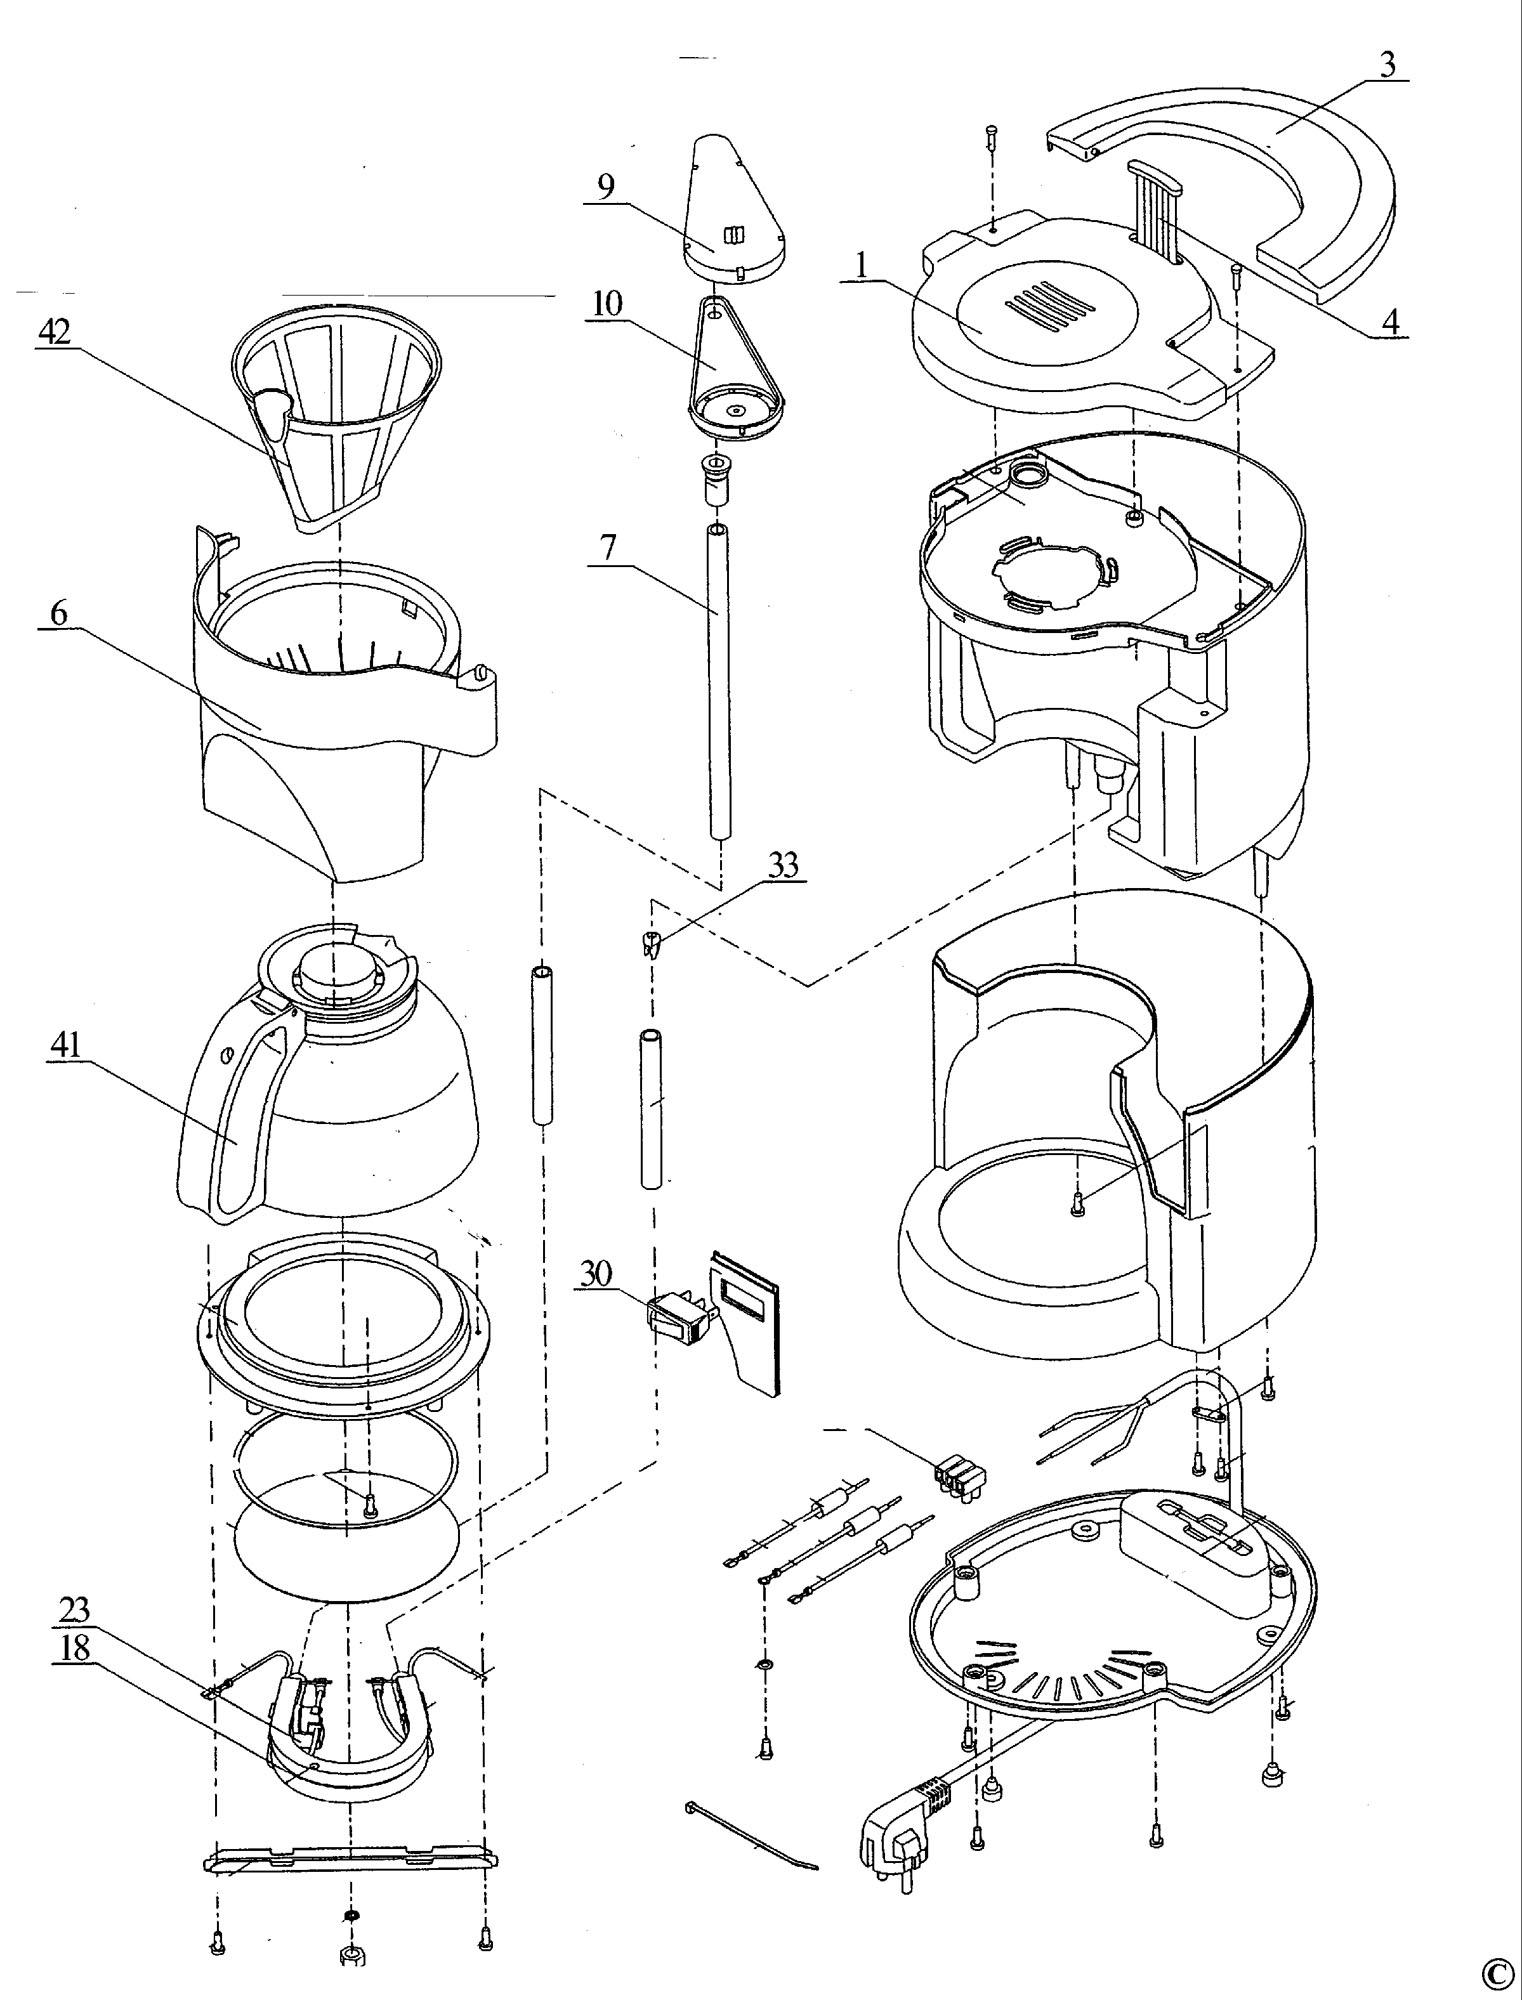 Spares For Black Amp Decker Dcm70f Coffeemaker Type 1